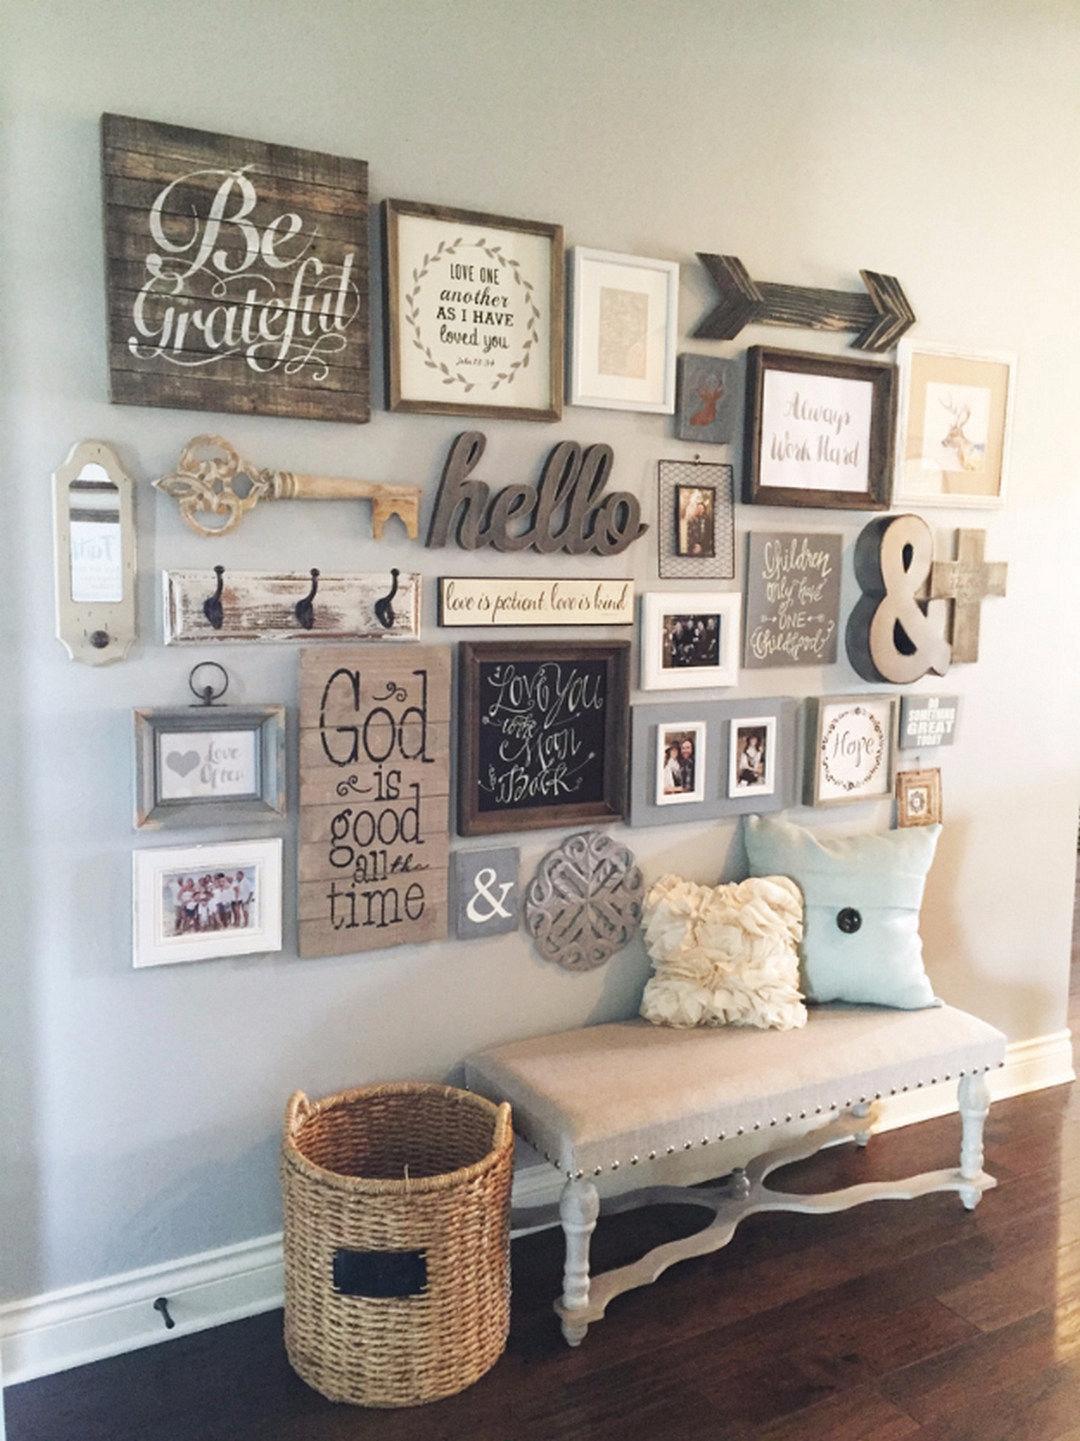 17 Diy Rustic Home Decor Ideas For Living Room Decor Home Decor Living Decor